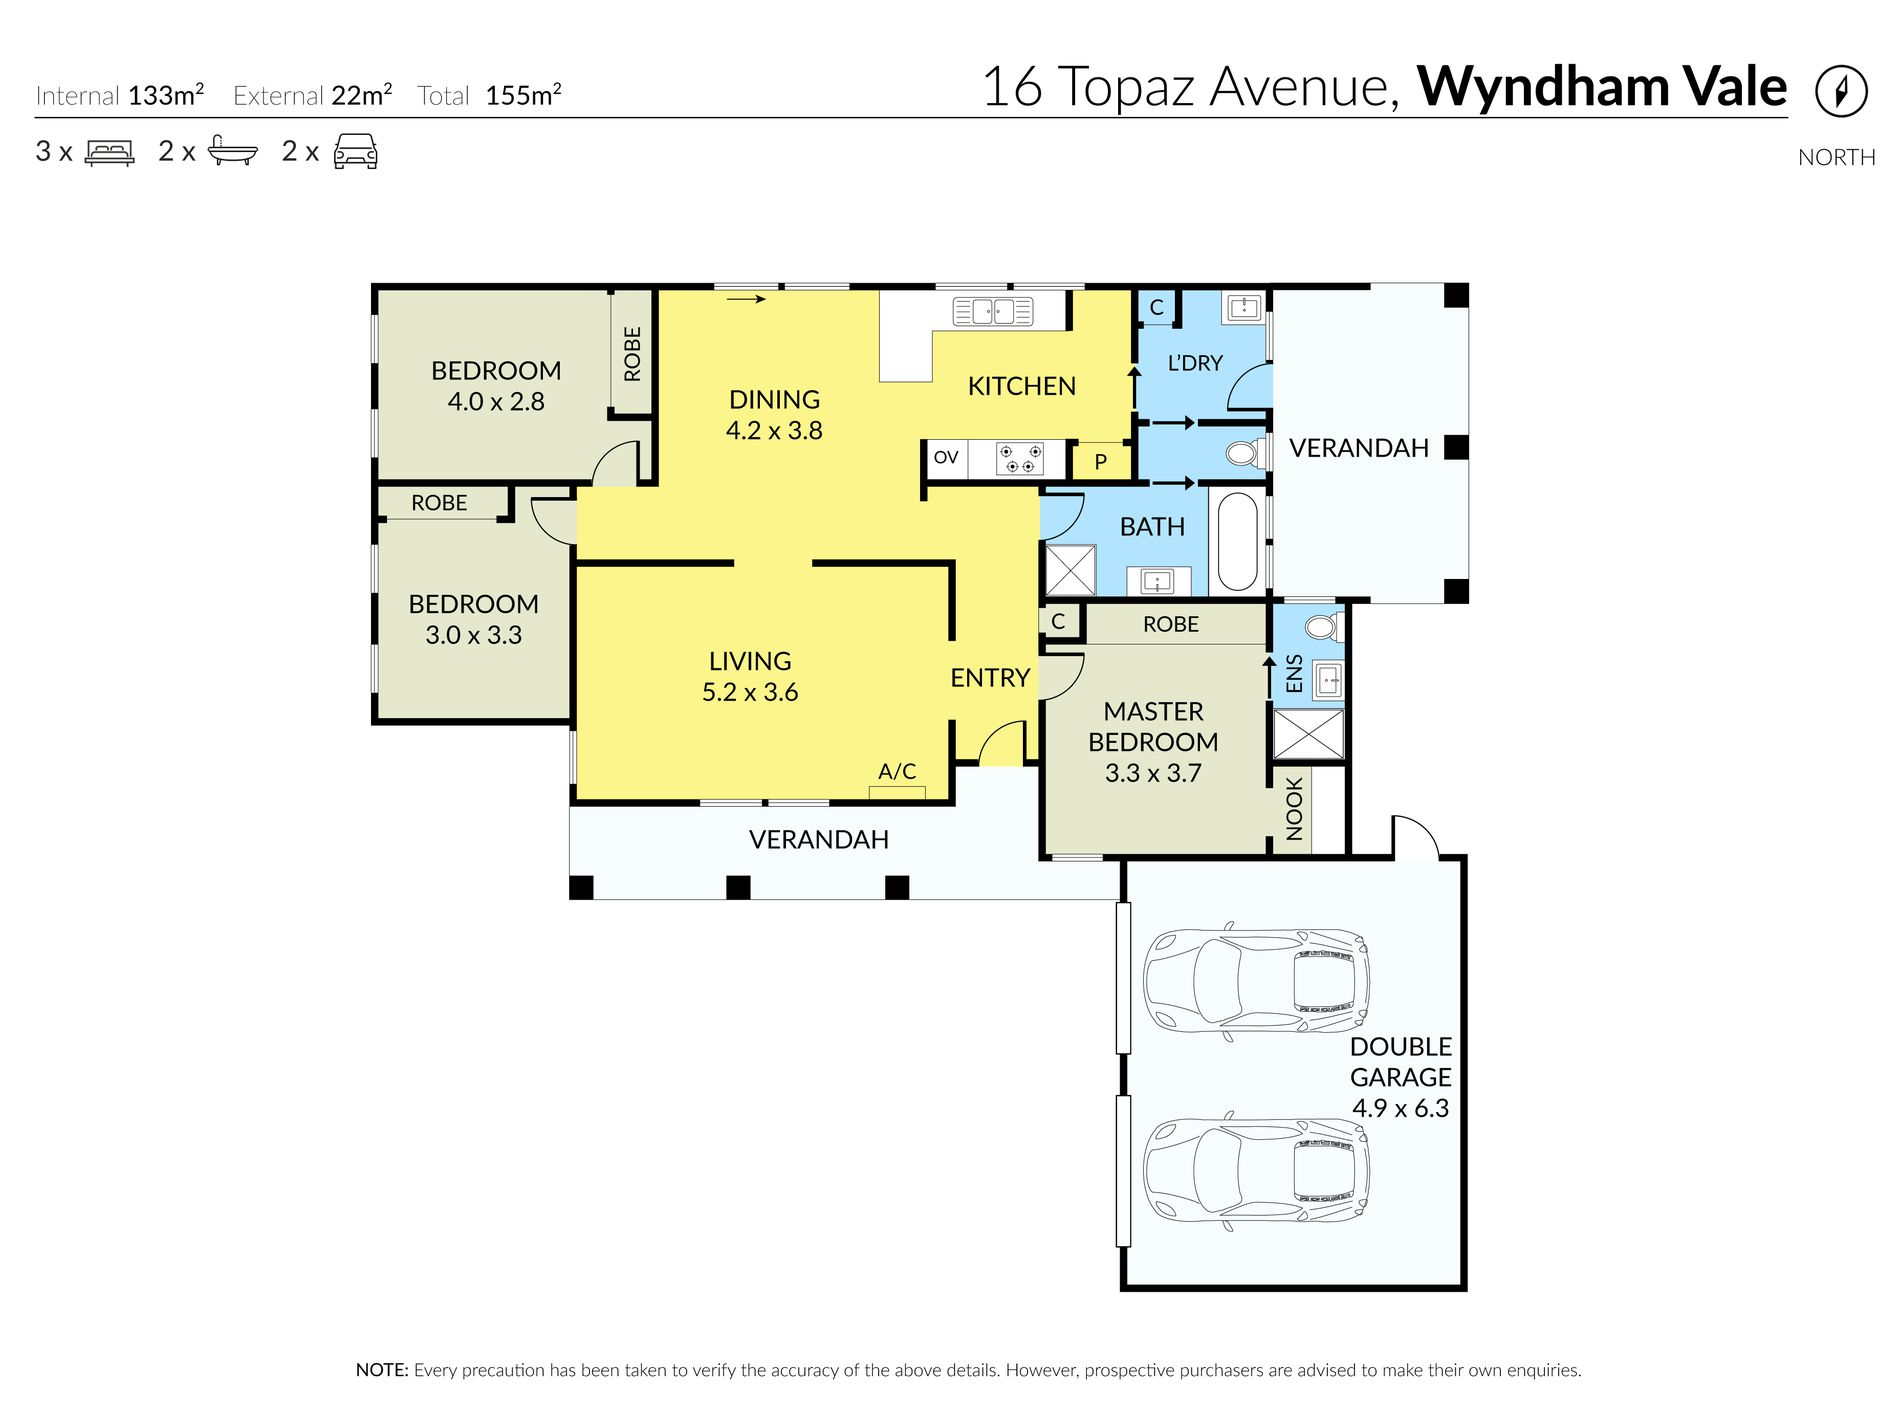 16 Topaz Avenue, Wyndham Vale